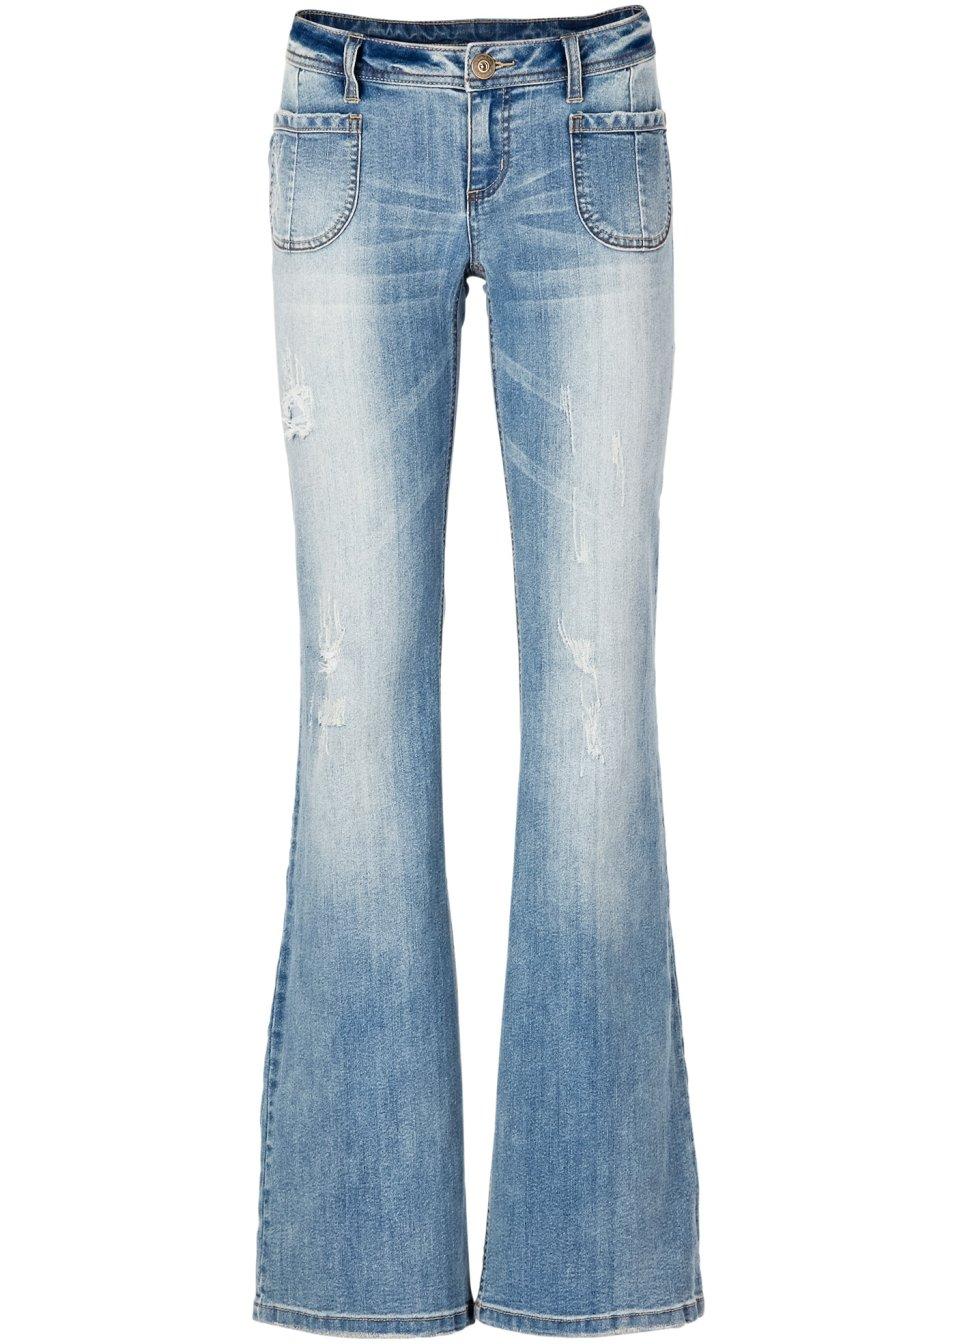 coole schlag jeans mit auff lliger waschung blue stone. Black Bedroom Furniture Sets. Home Design Ideas